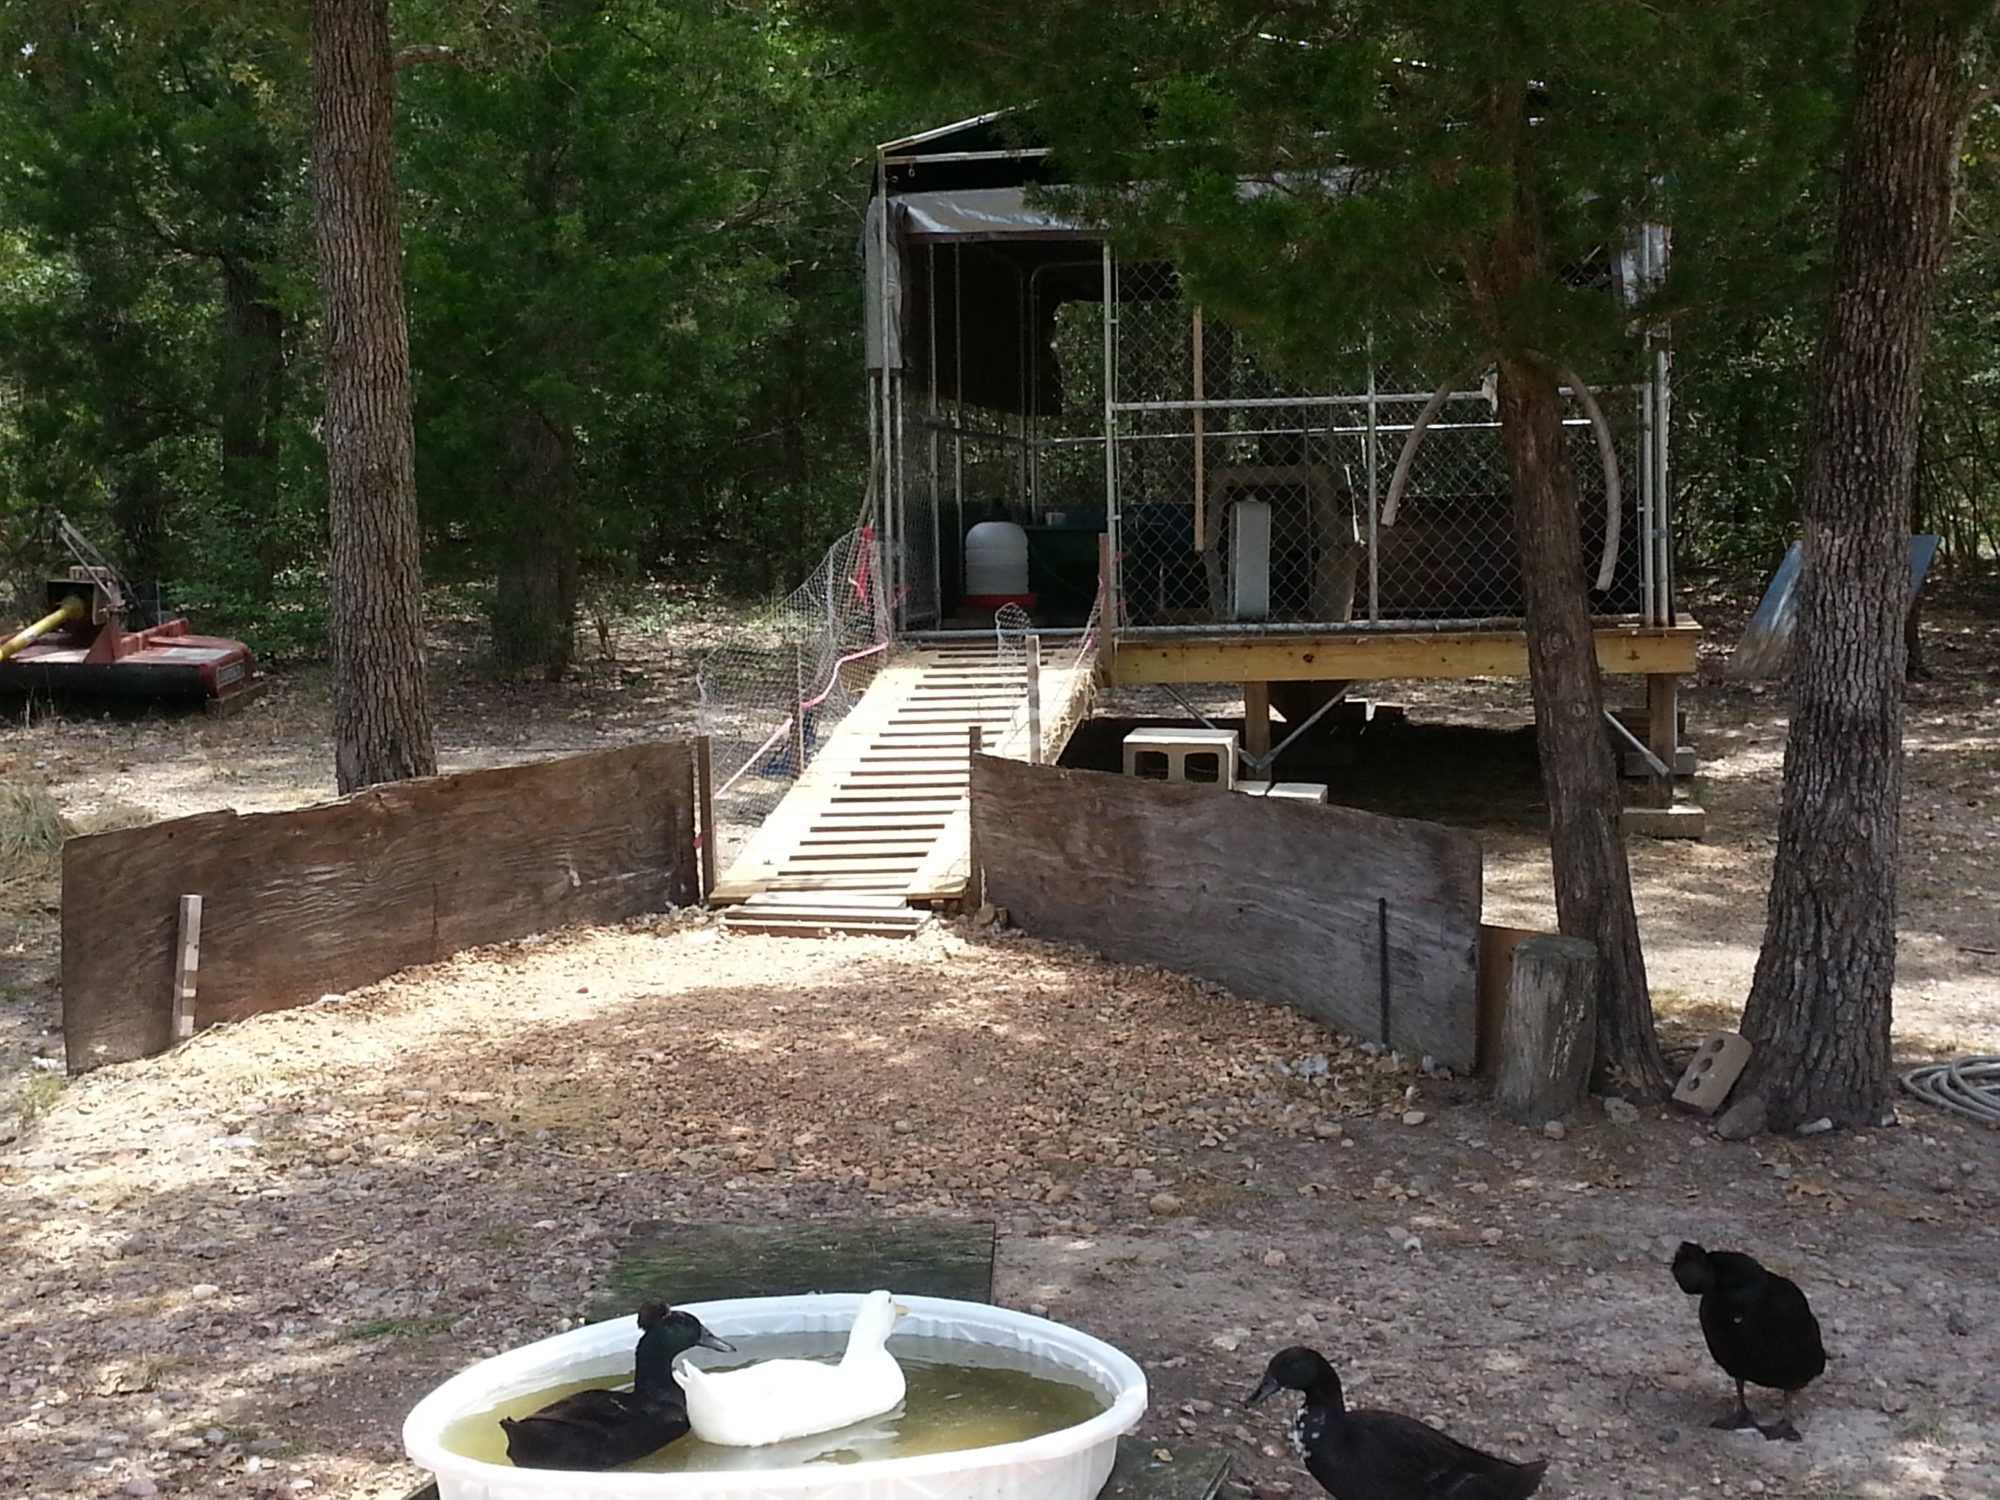 Enclosure with ramp